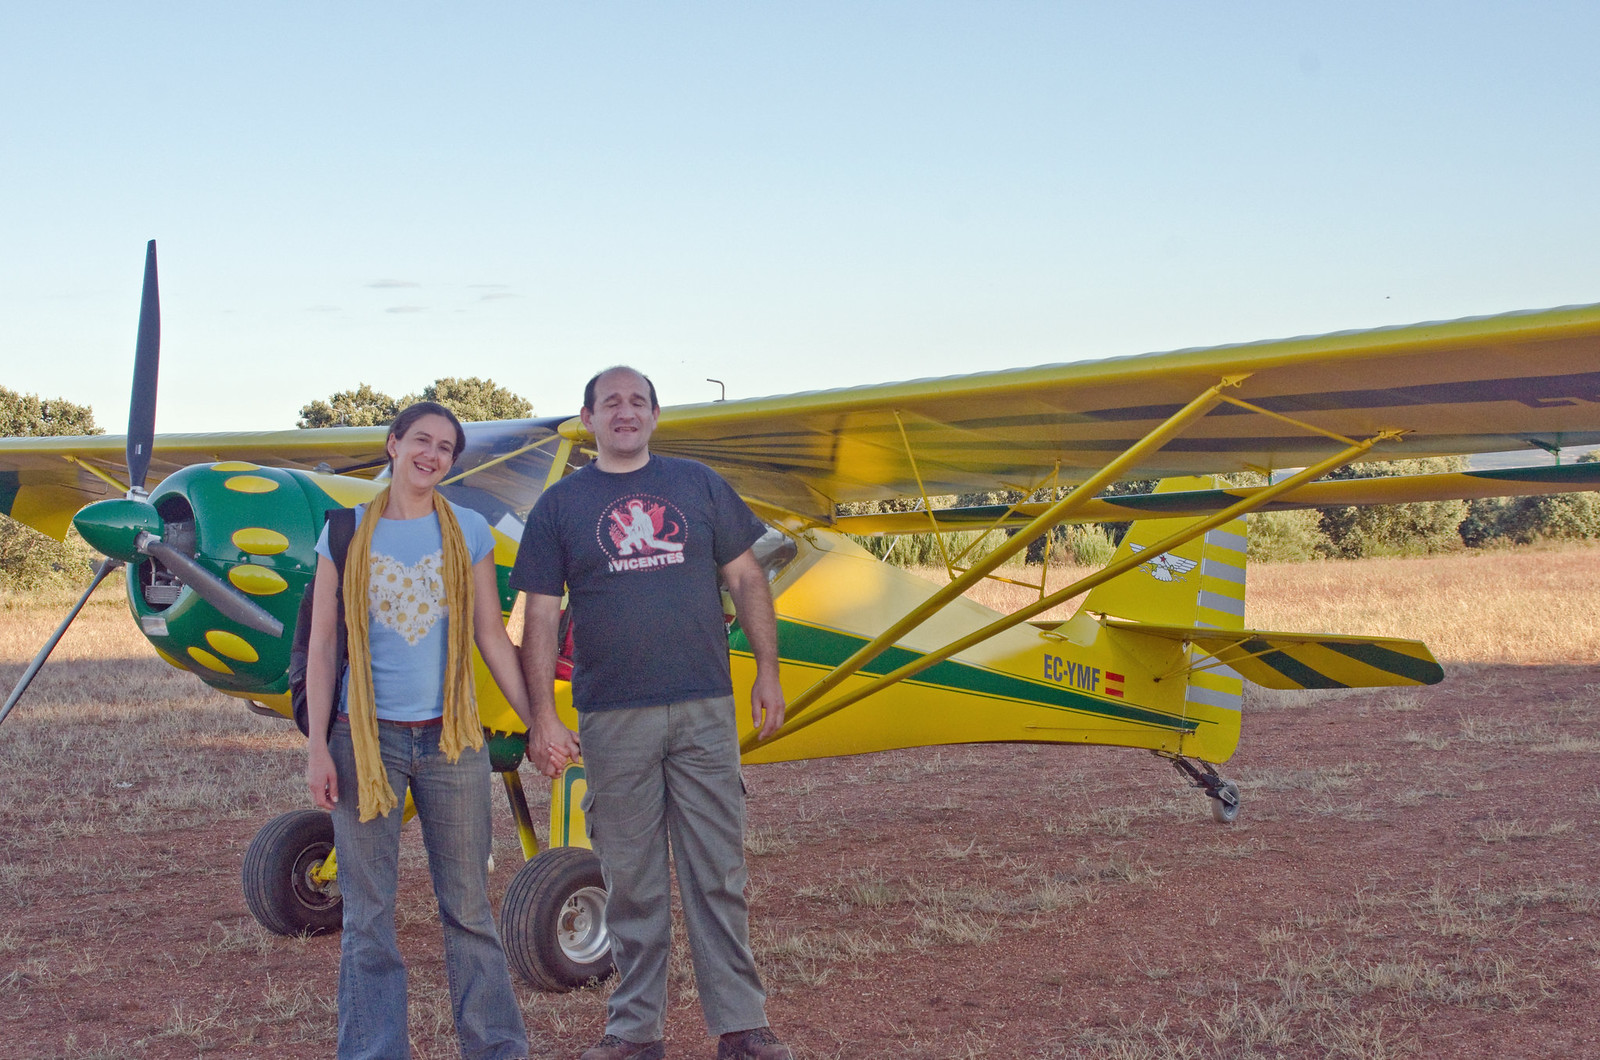 Aerodromo Kitfox  vuelo como premio de sorteo promocional (20)